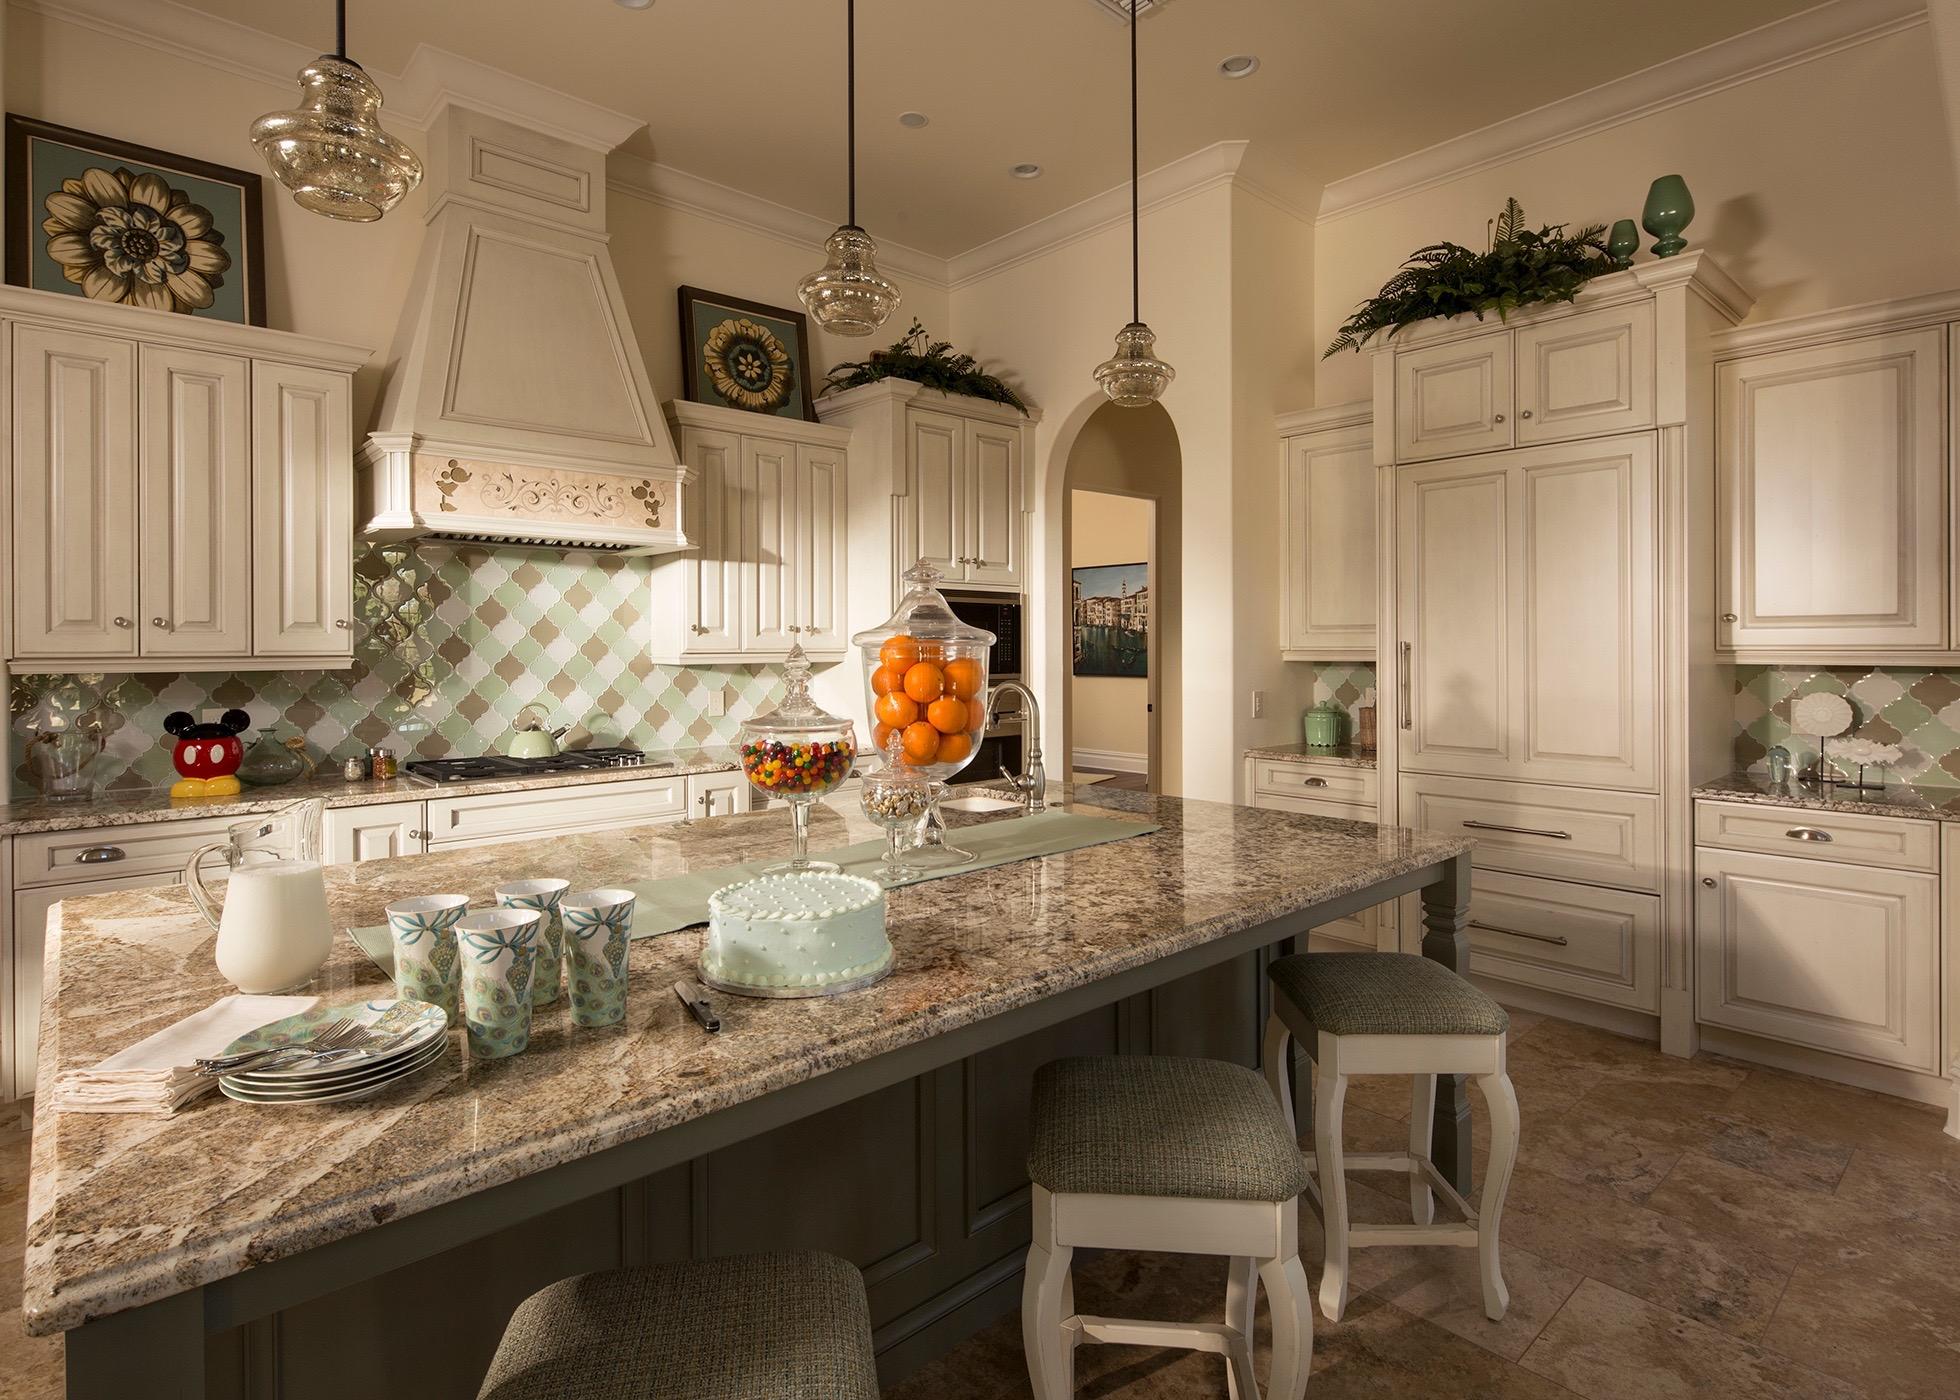 Lot 008 Kitchen 0121ZV_0623KP_med.jpg